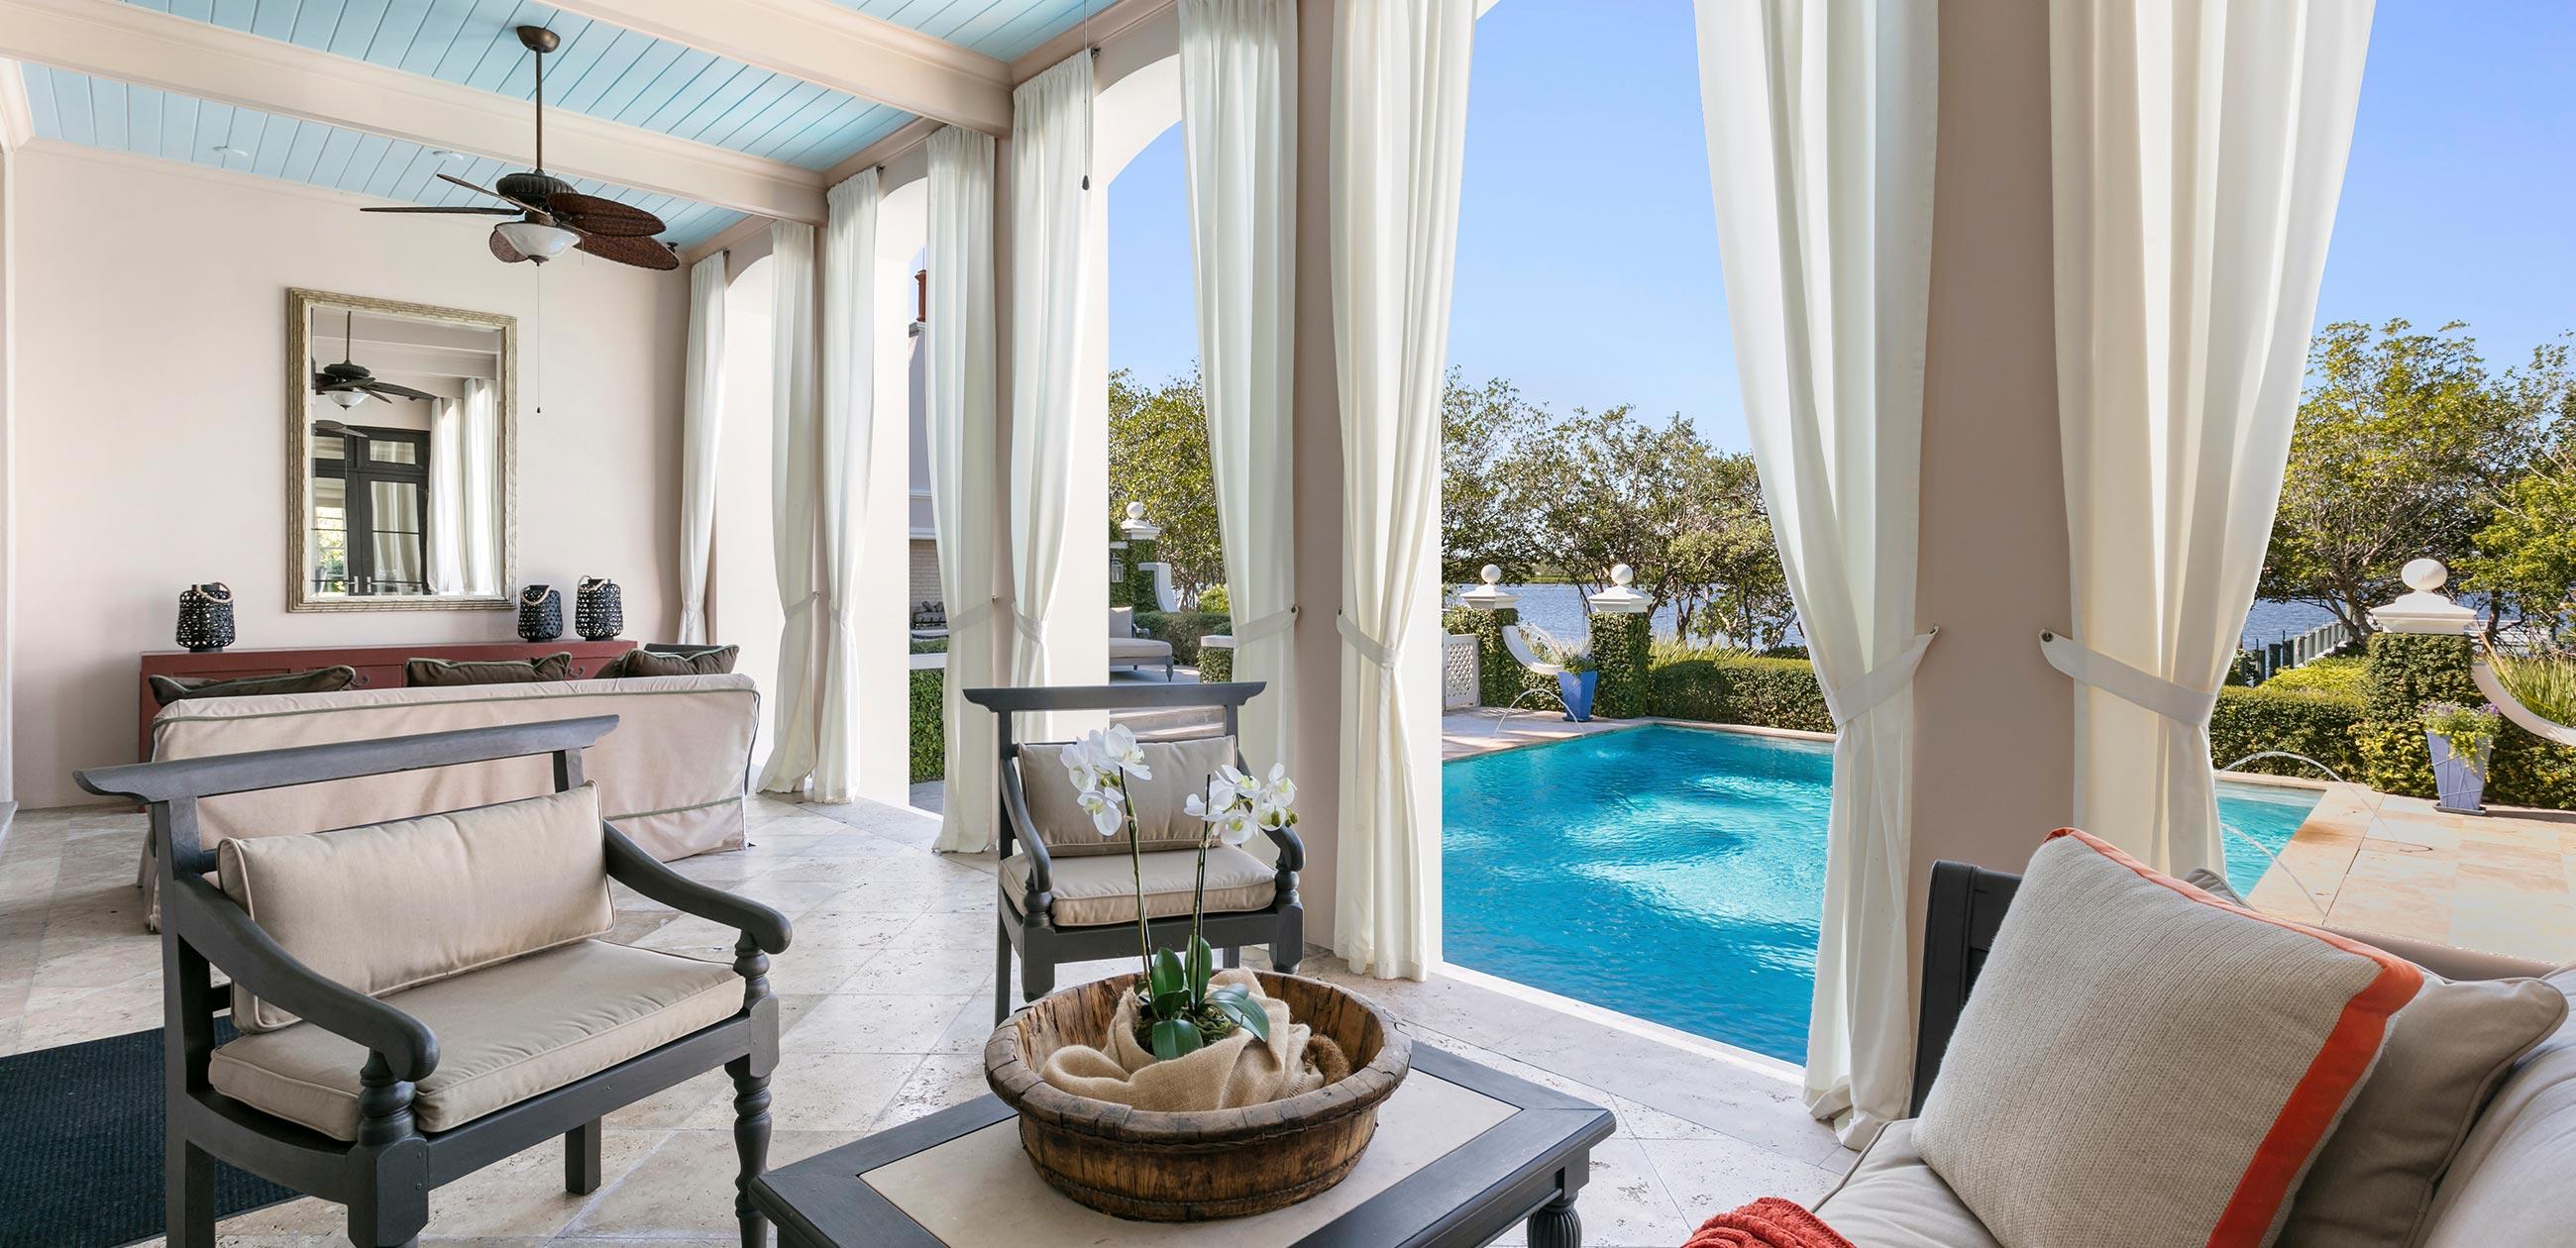 Dale Sorensen Real Estate-Vero Beach, Sebastian, Indialantic